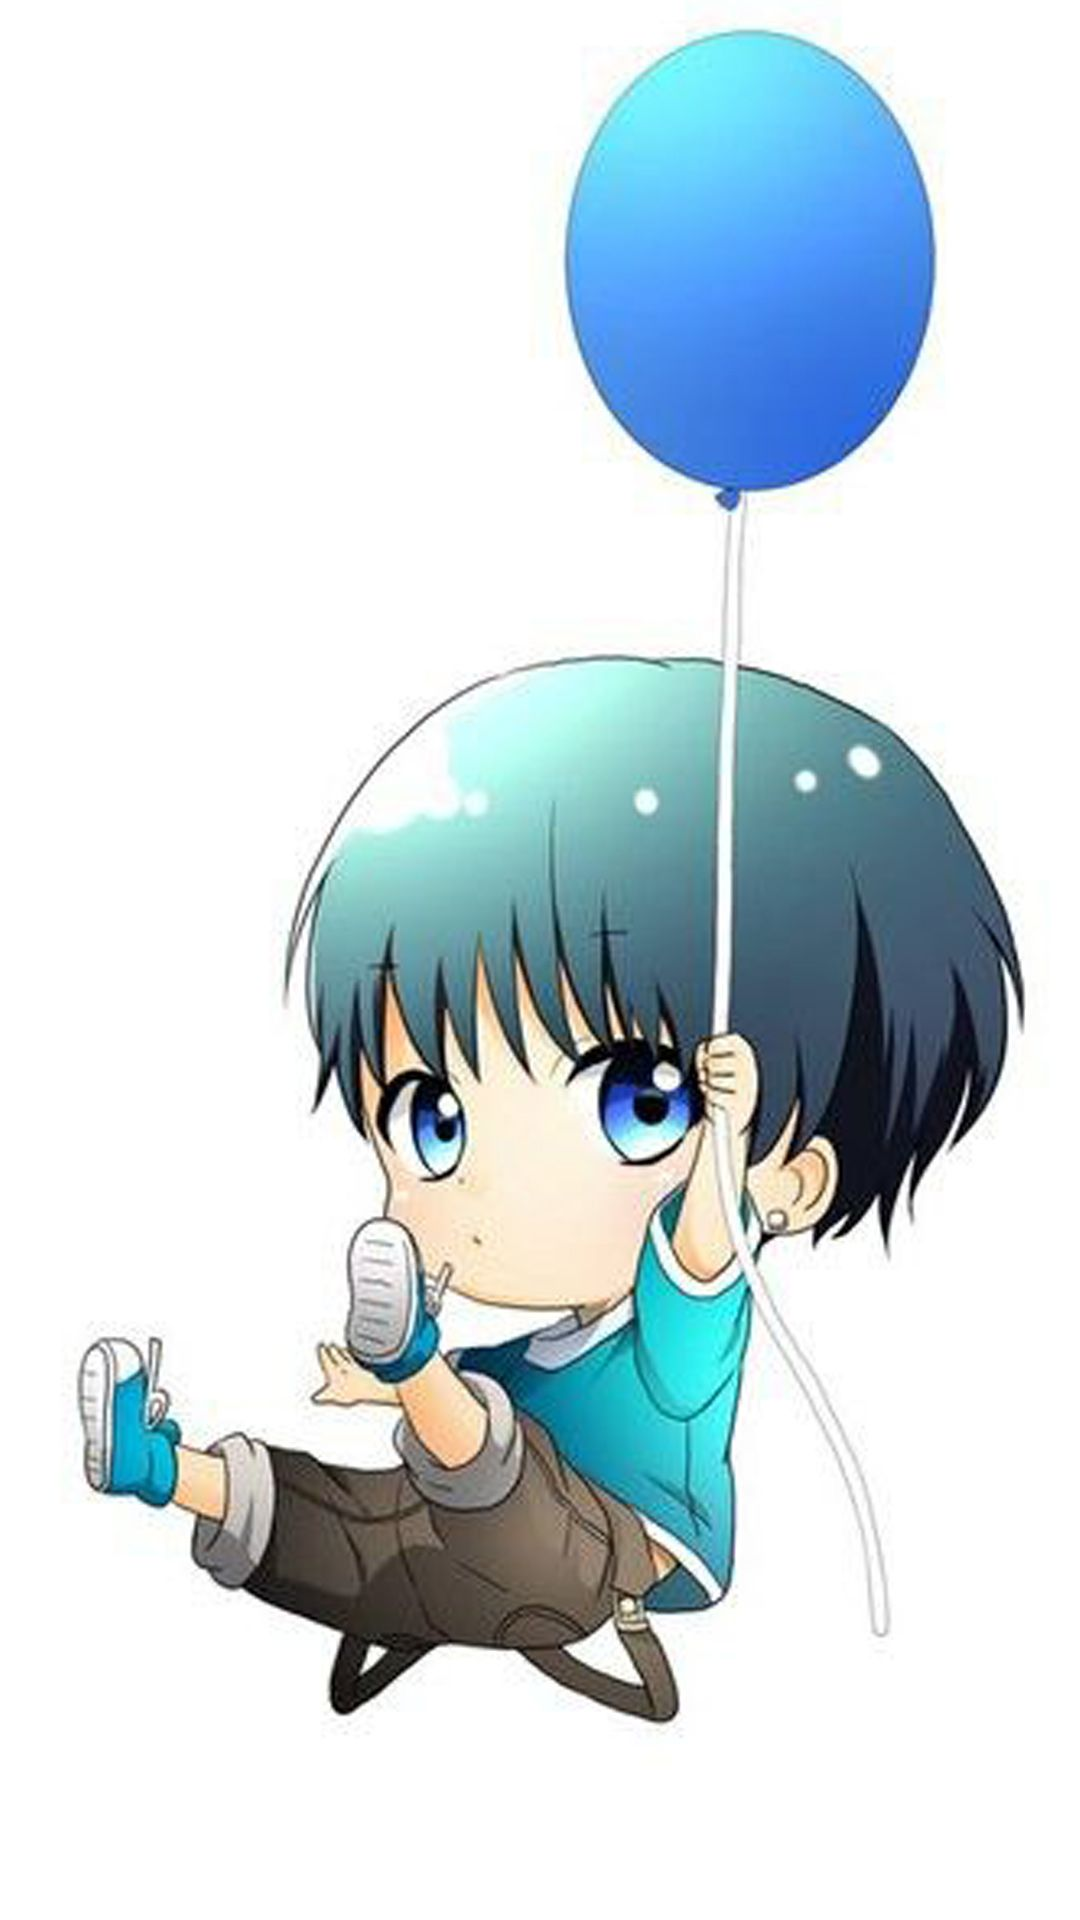 Funny D Cartoon Wallpapers Wallpaper Cute Anime Chibi Chibi Anime Chibi